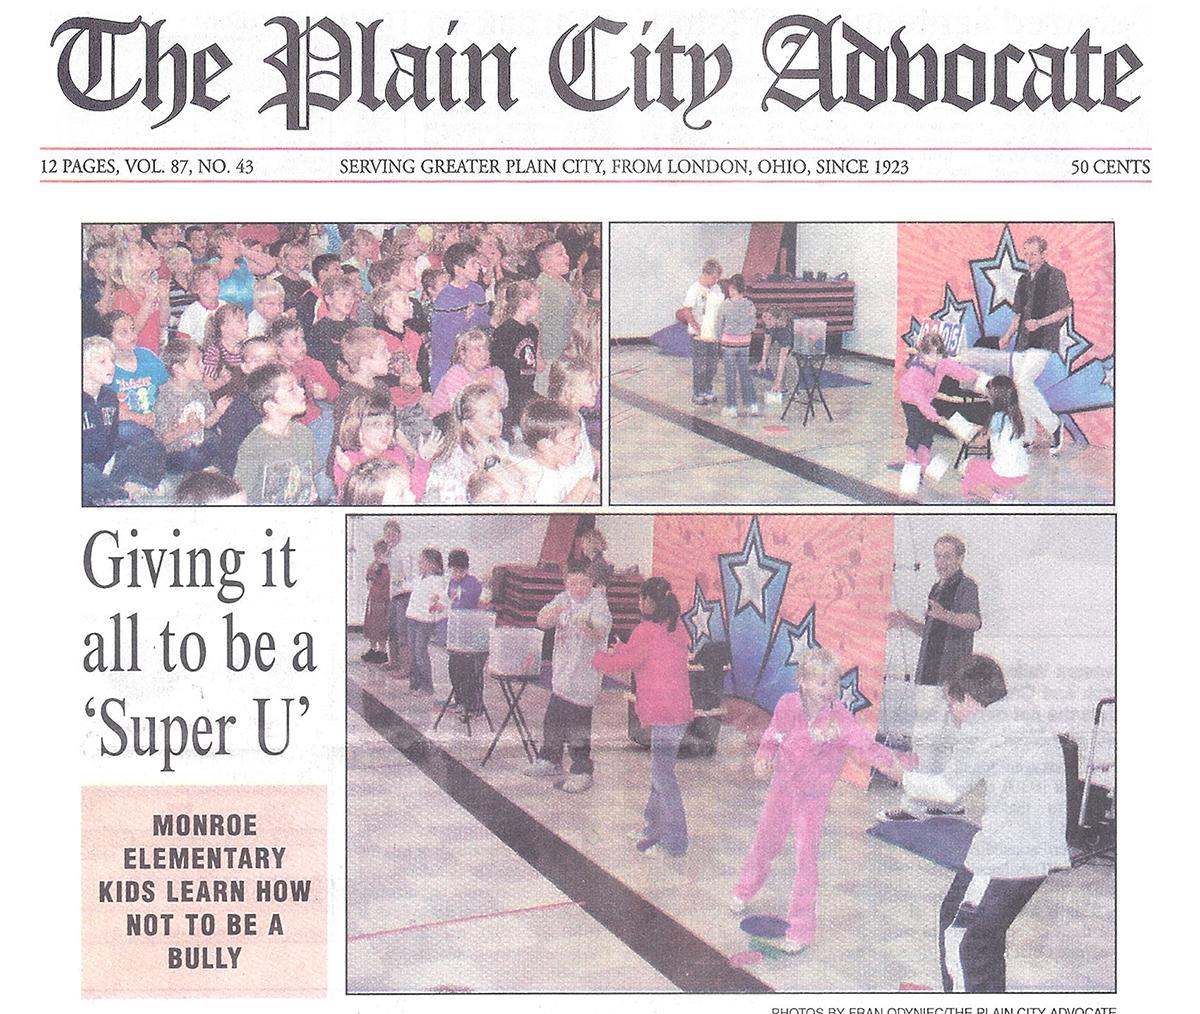 Bullyinginschools-article.jpg